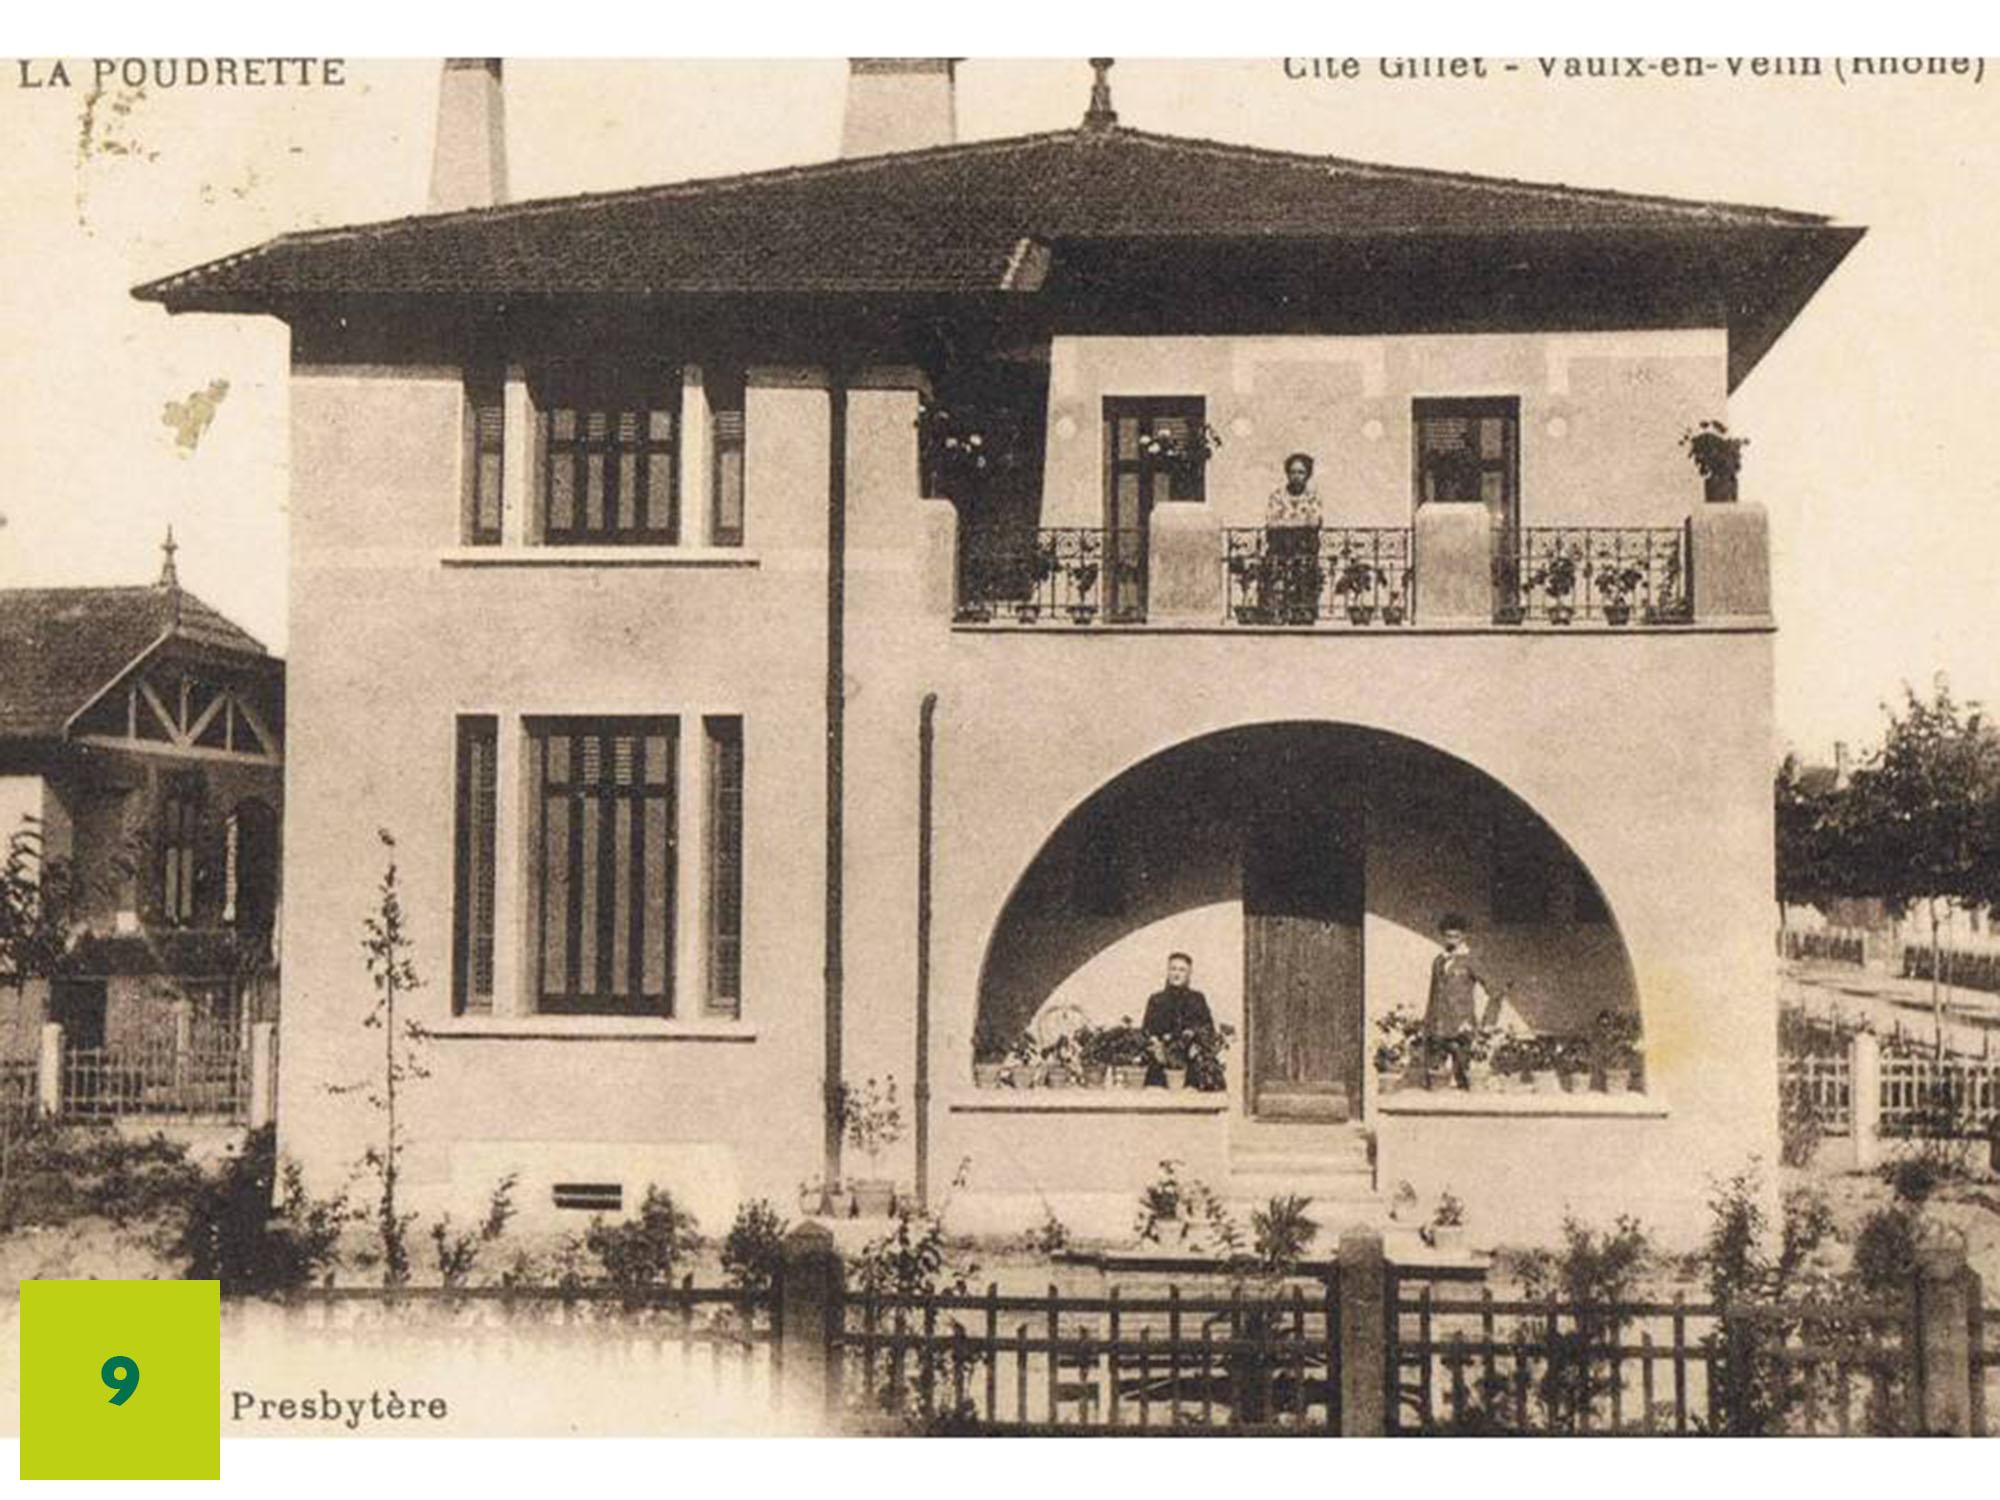 CFEL, usine hydraulique de Cusset, usine TASE, cités jardins